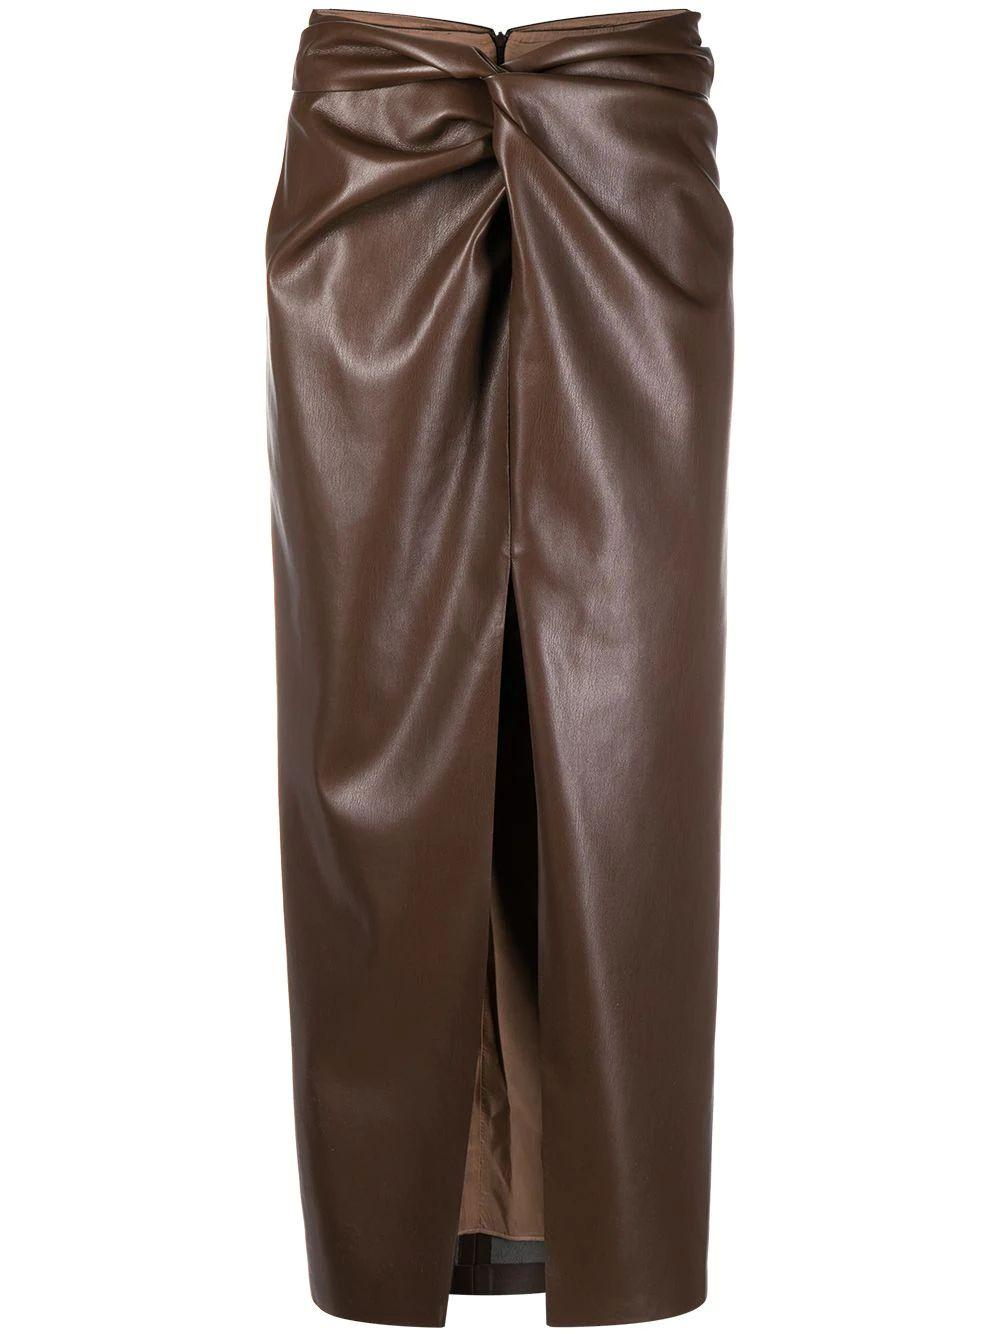 Inci Vegan Leather Skirt